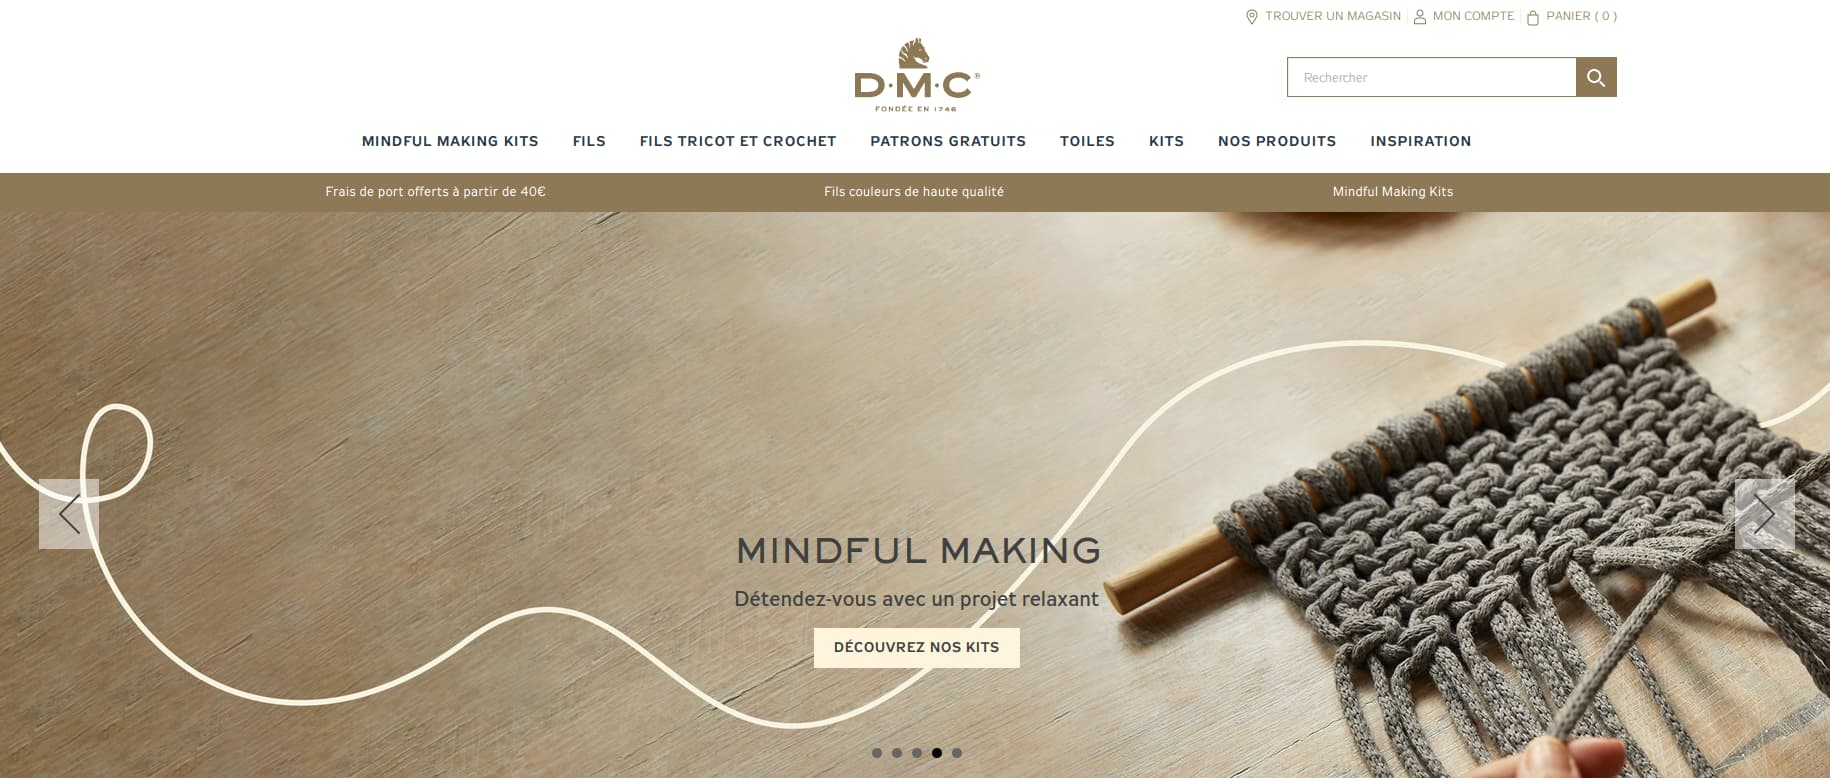 Site internet DMC